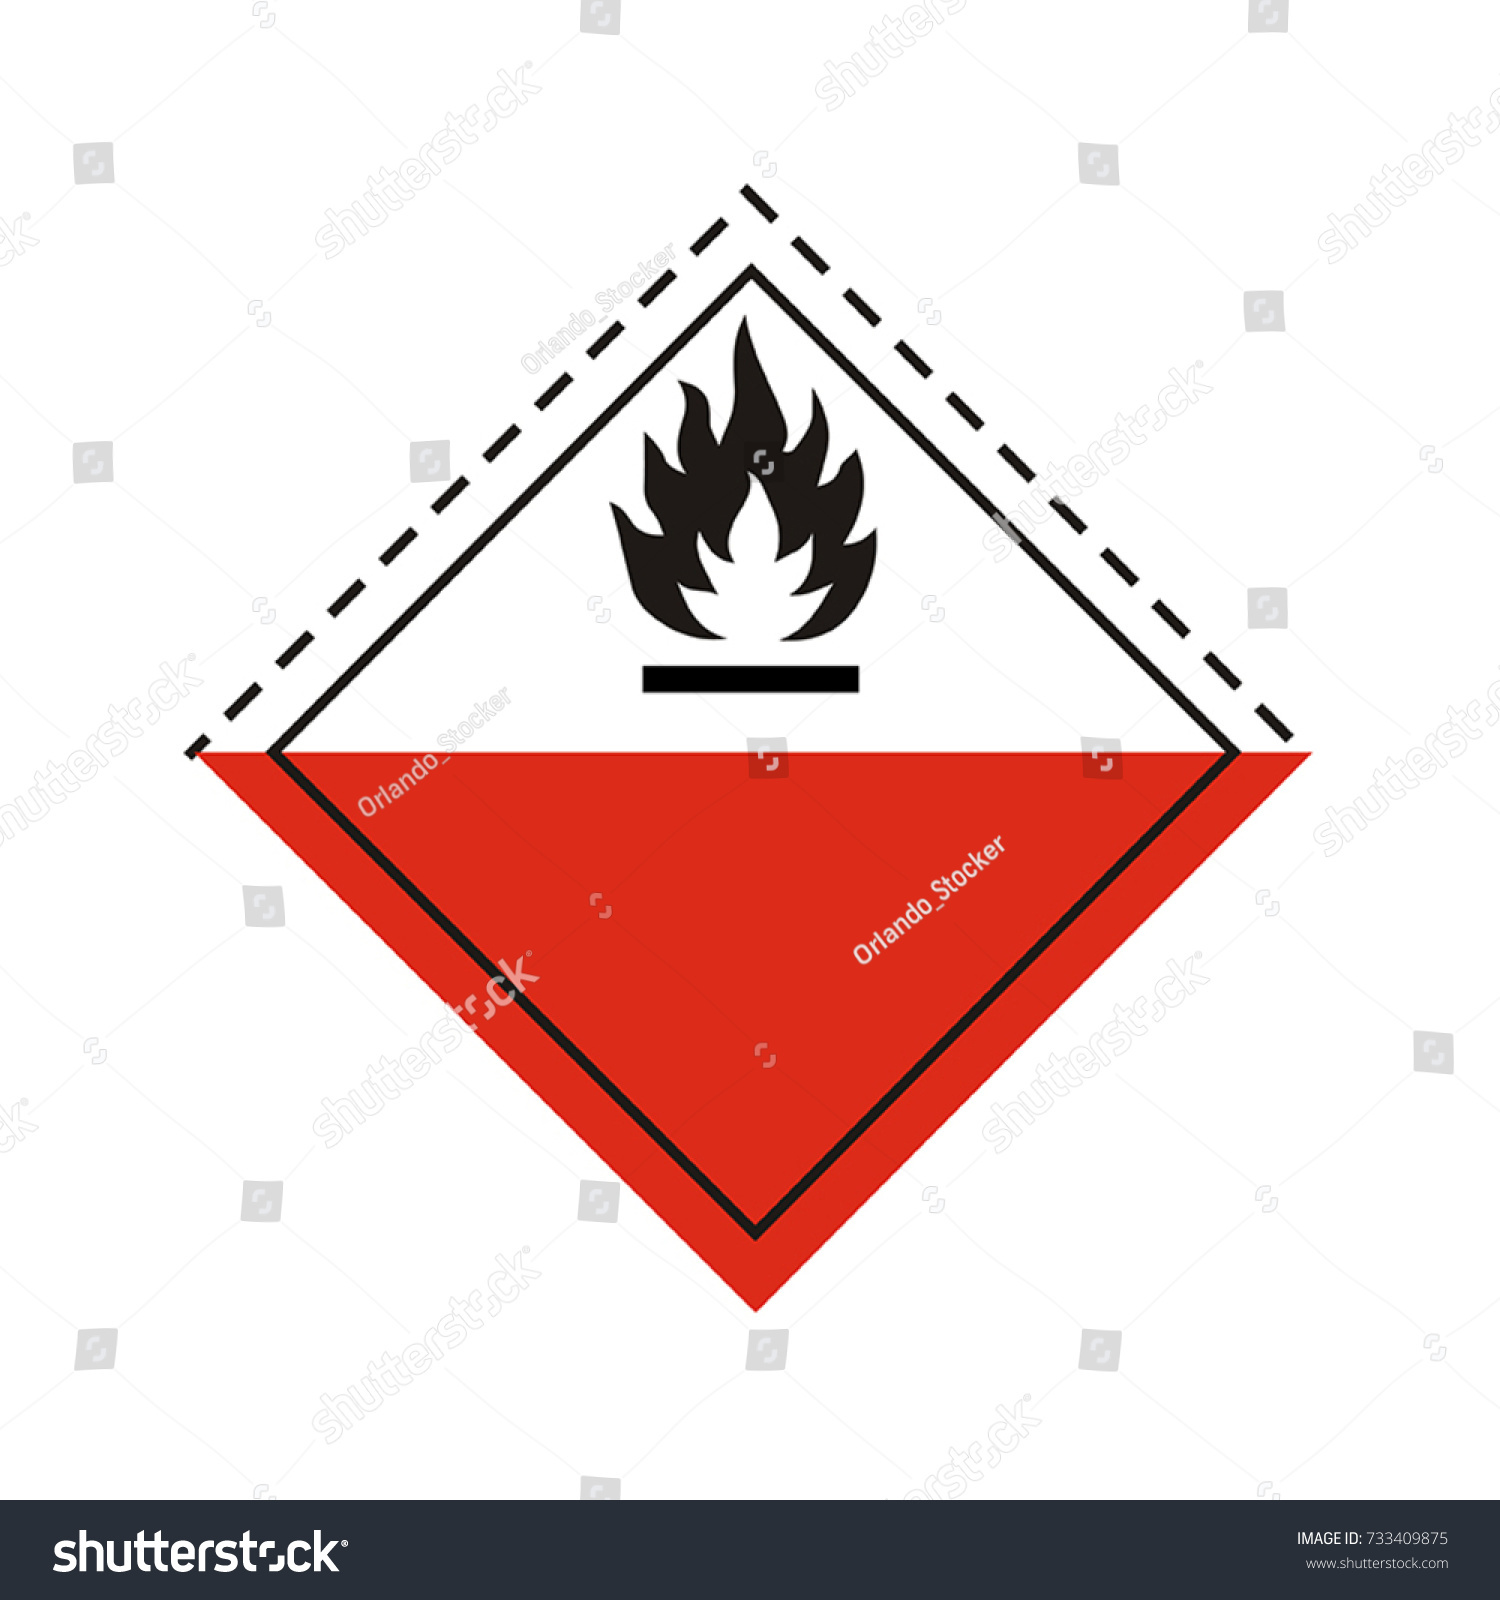 Standard pictogam flammable symbol selfheating substances stock standard pictogam of flammable symbol self heating substances and mixtures warning sign of buycottarizona